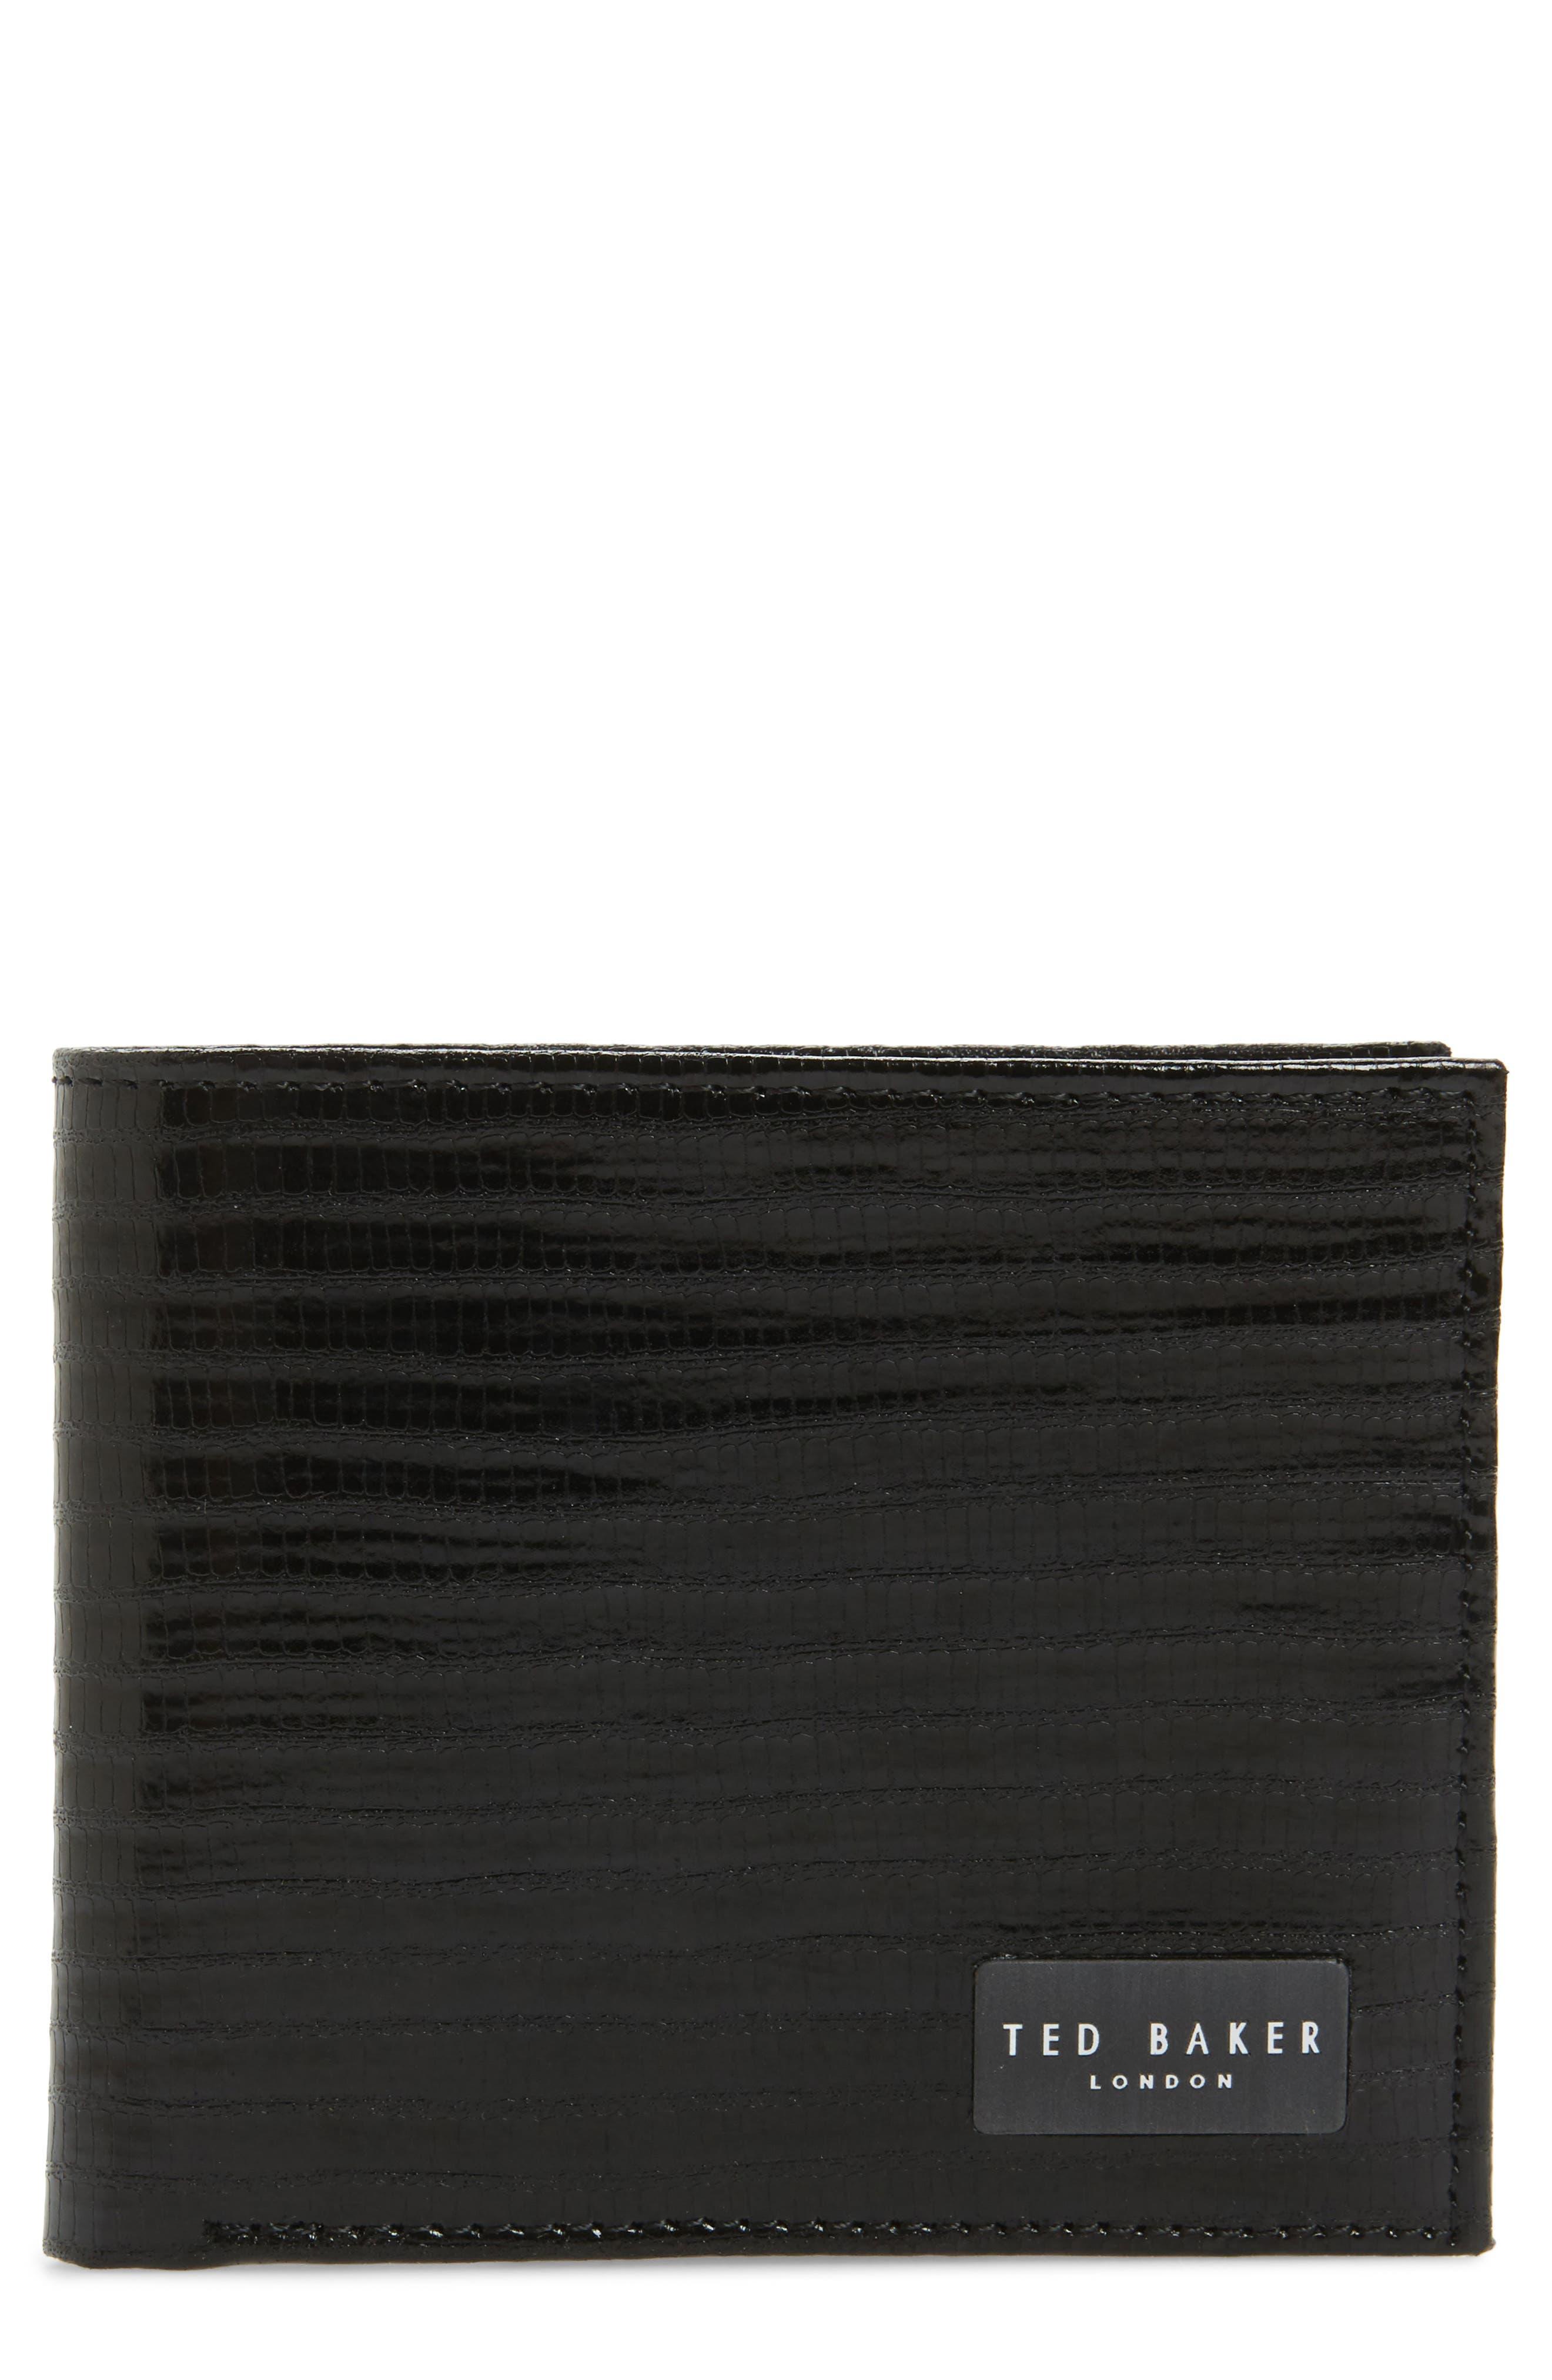 Slayts Leather Wallet,                         Main,                         color, 001